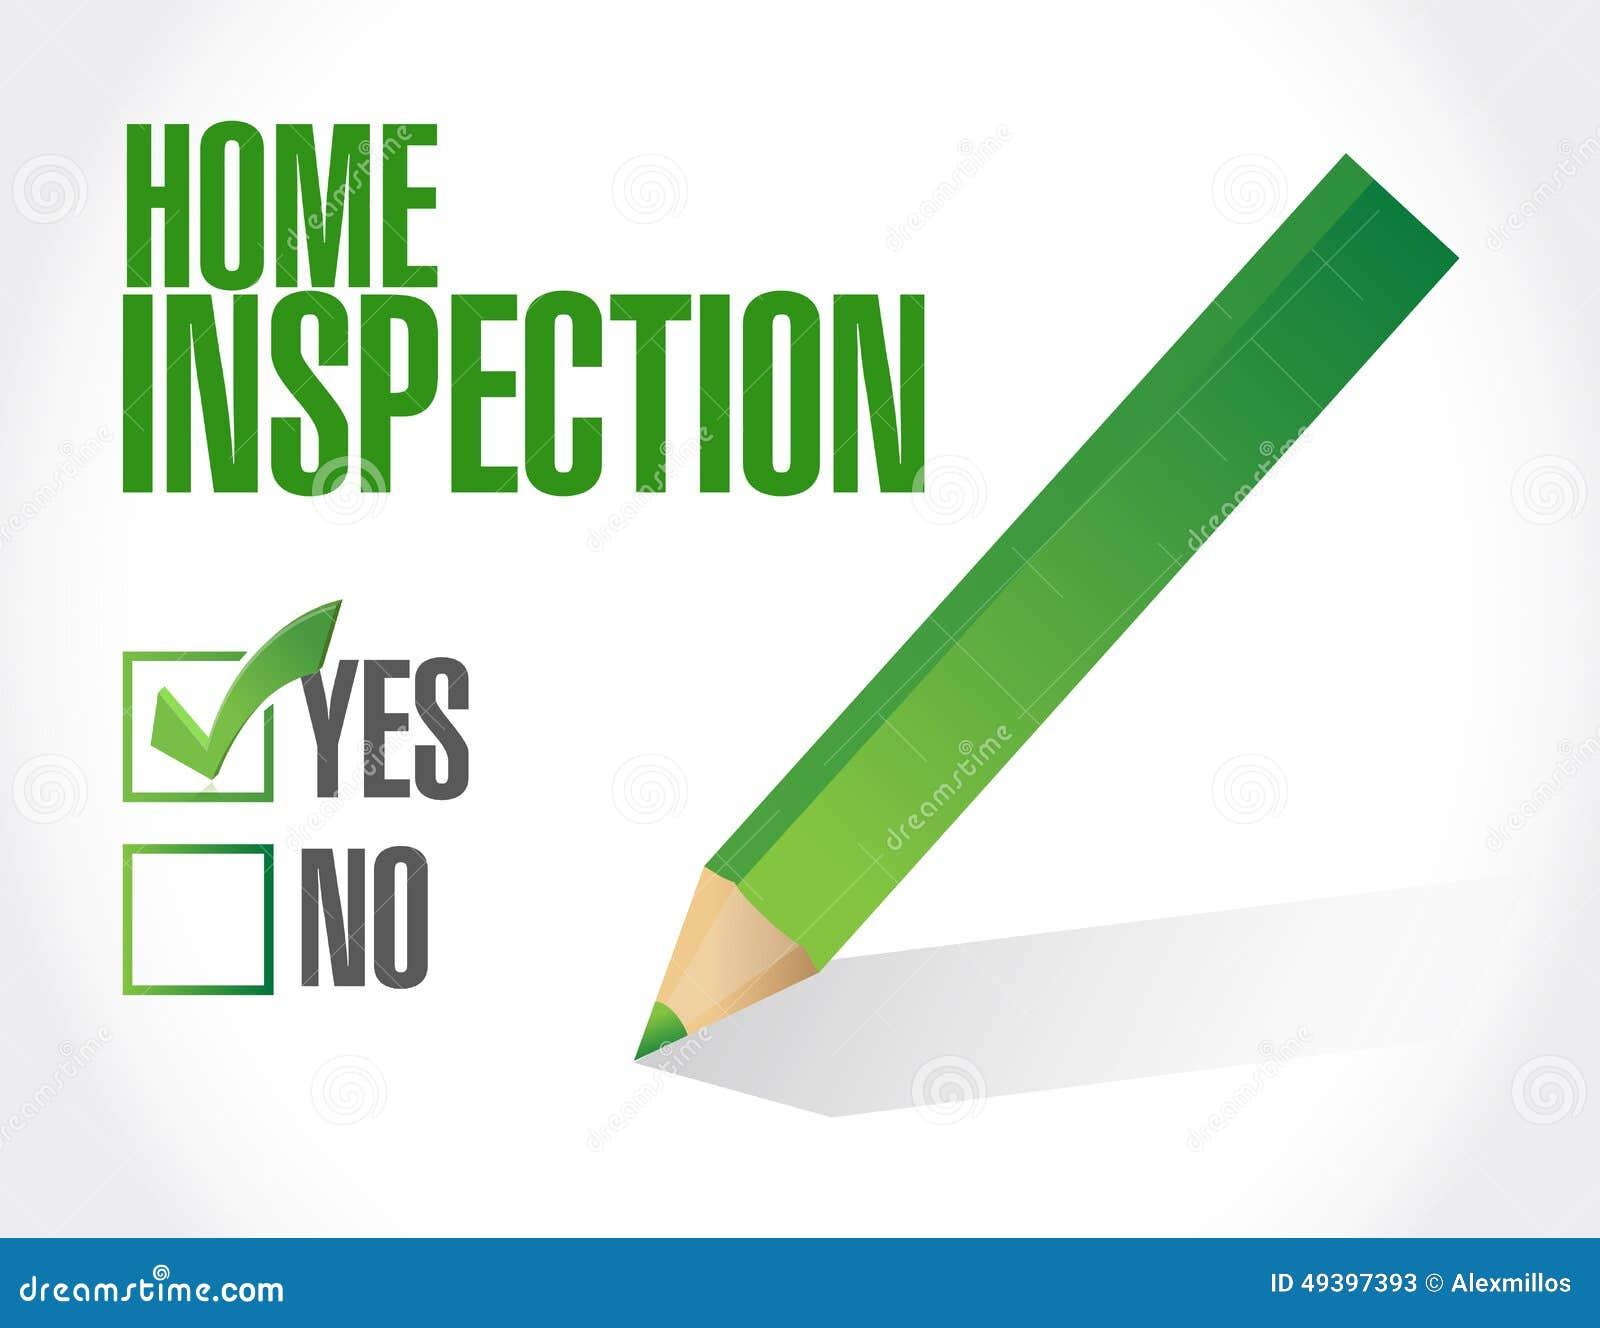 home inspection check list illustration stock illustration image home inspection check list illustration stock illustration